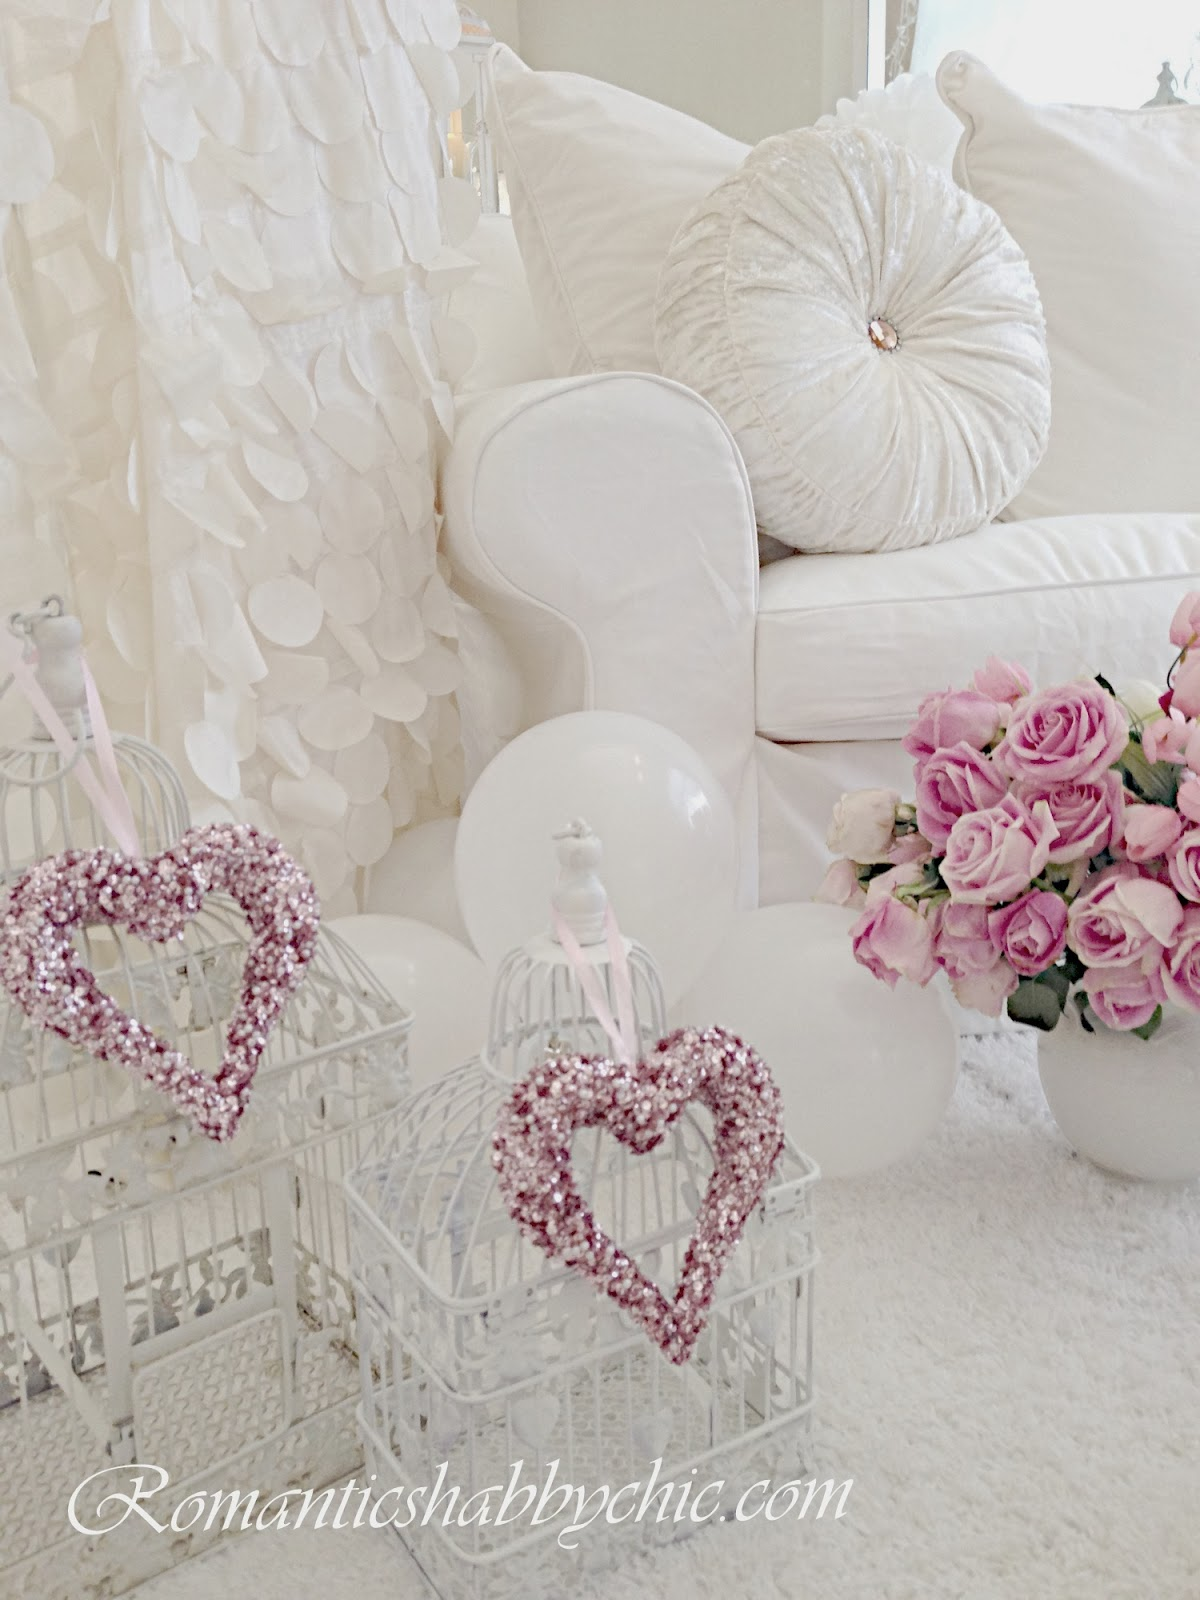 Romantic shabby chic home romantic shabby chic blog - Romantic Shabby Chic Blog Romantic Home Have A Nice Day